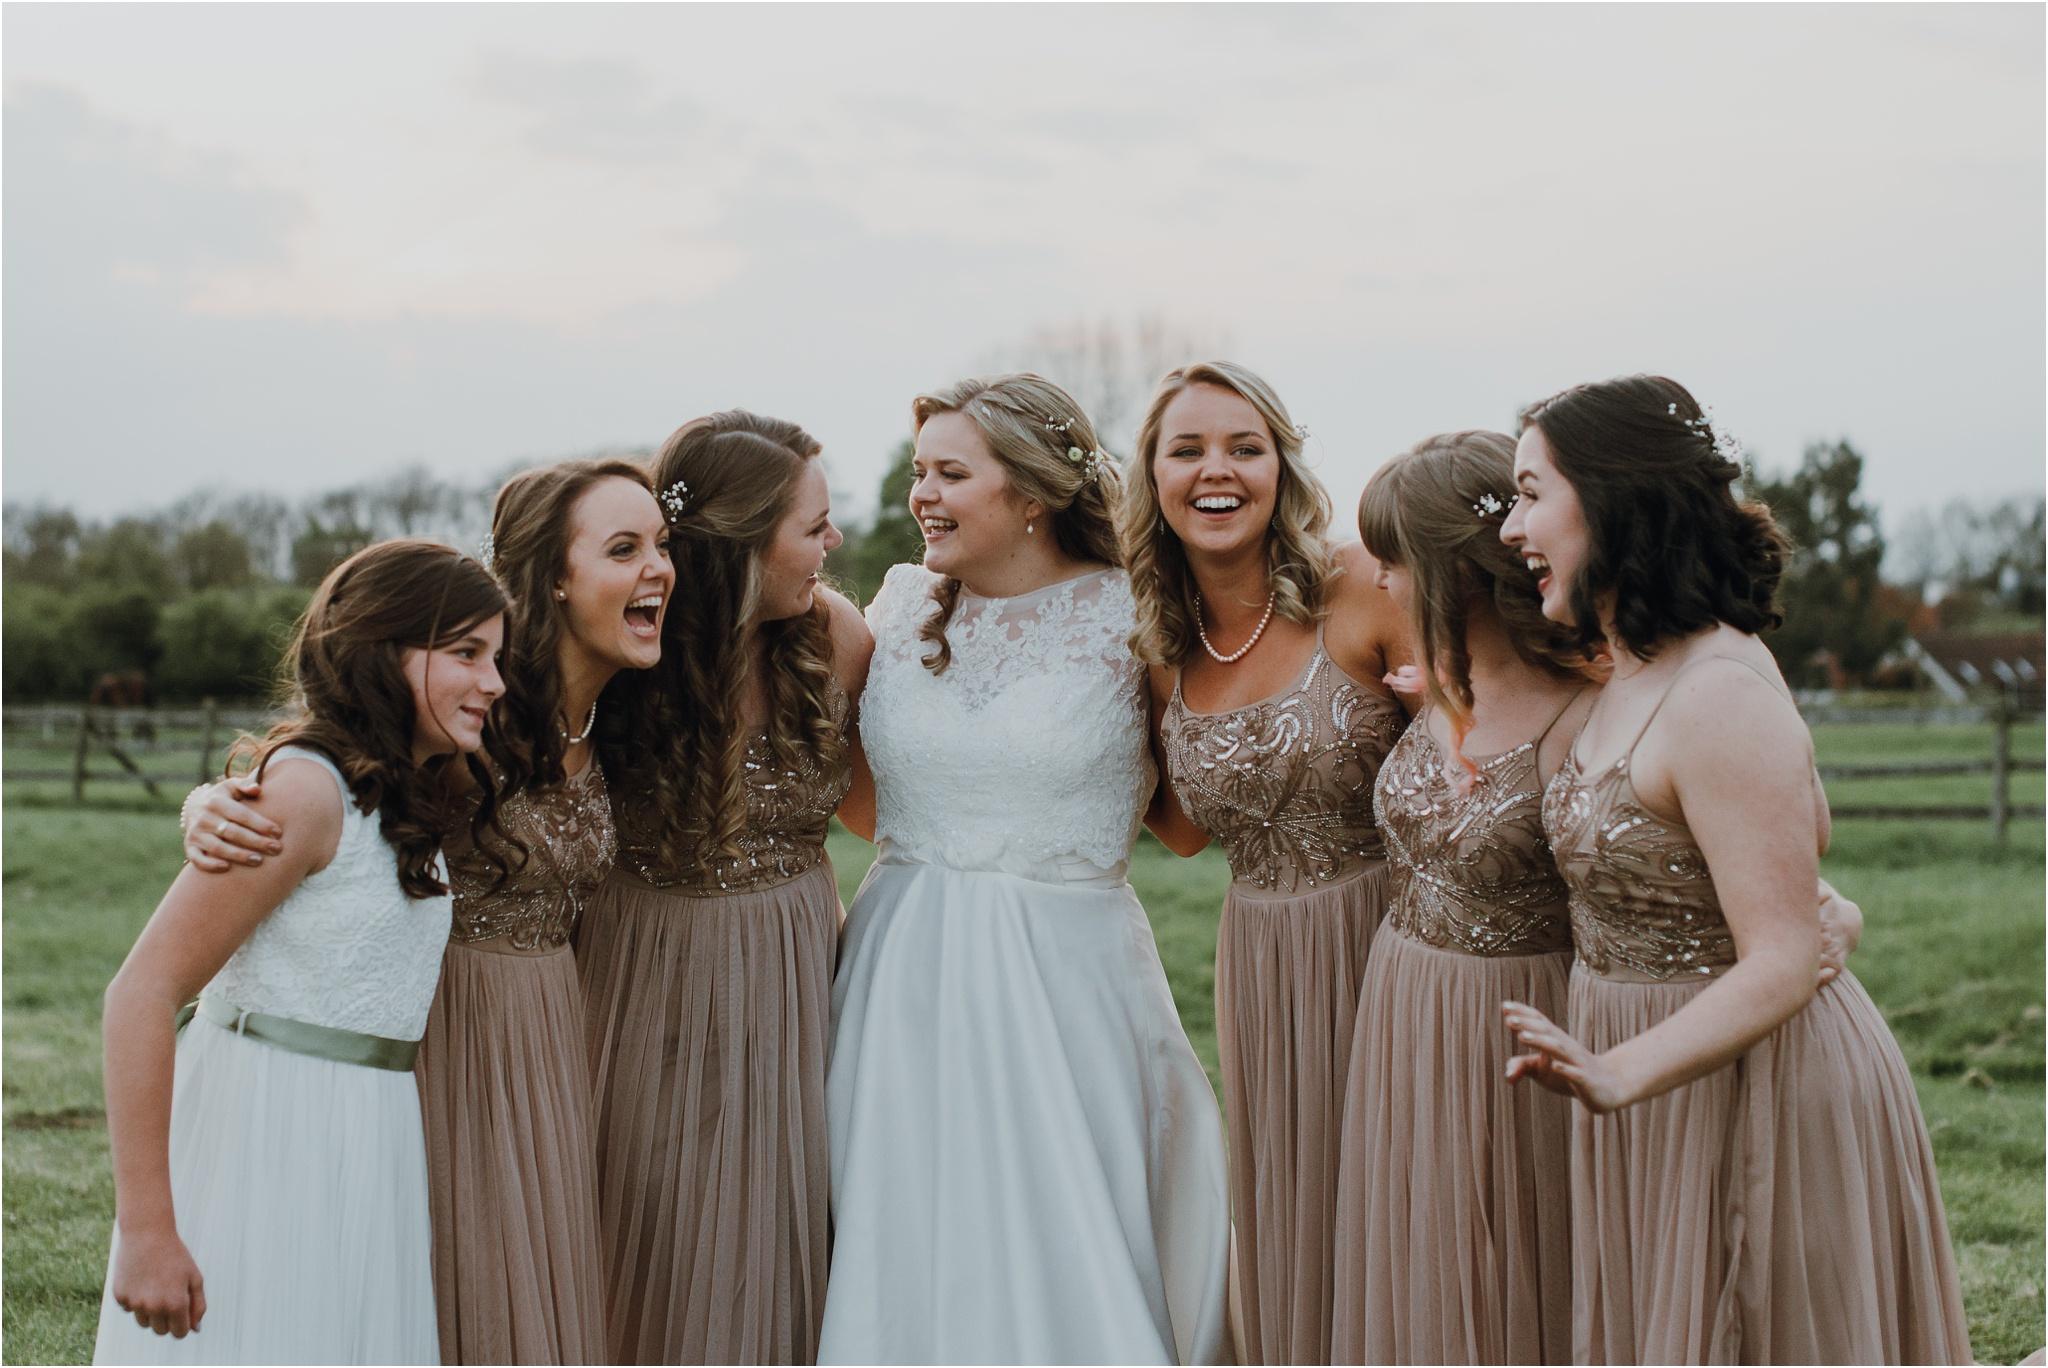 Outdoor-country-wedding-Edinburgh-photographer__0136.jpg